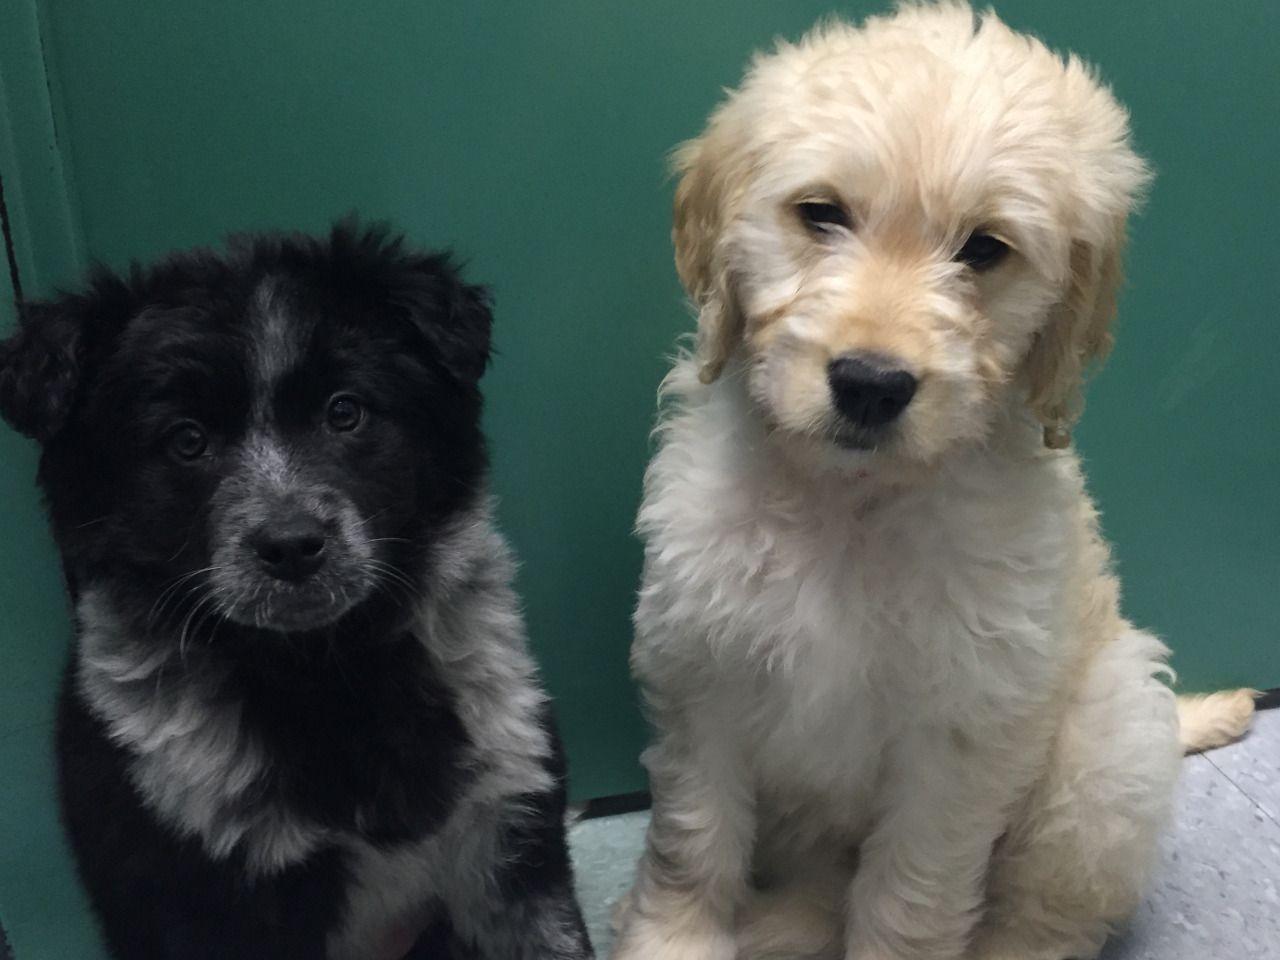 Handsomedogs Koda A Norwegian Elkhound Border Collie Mix And